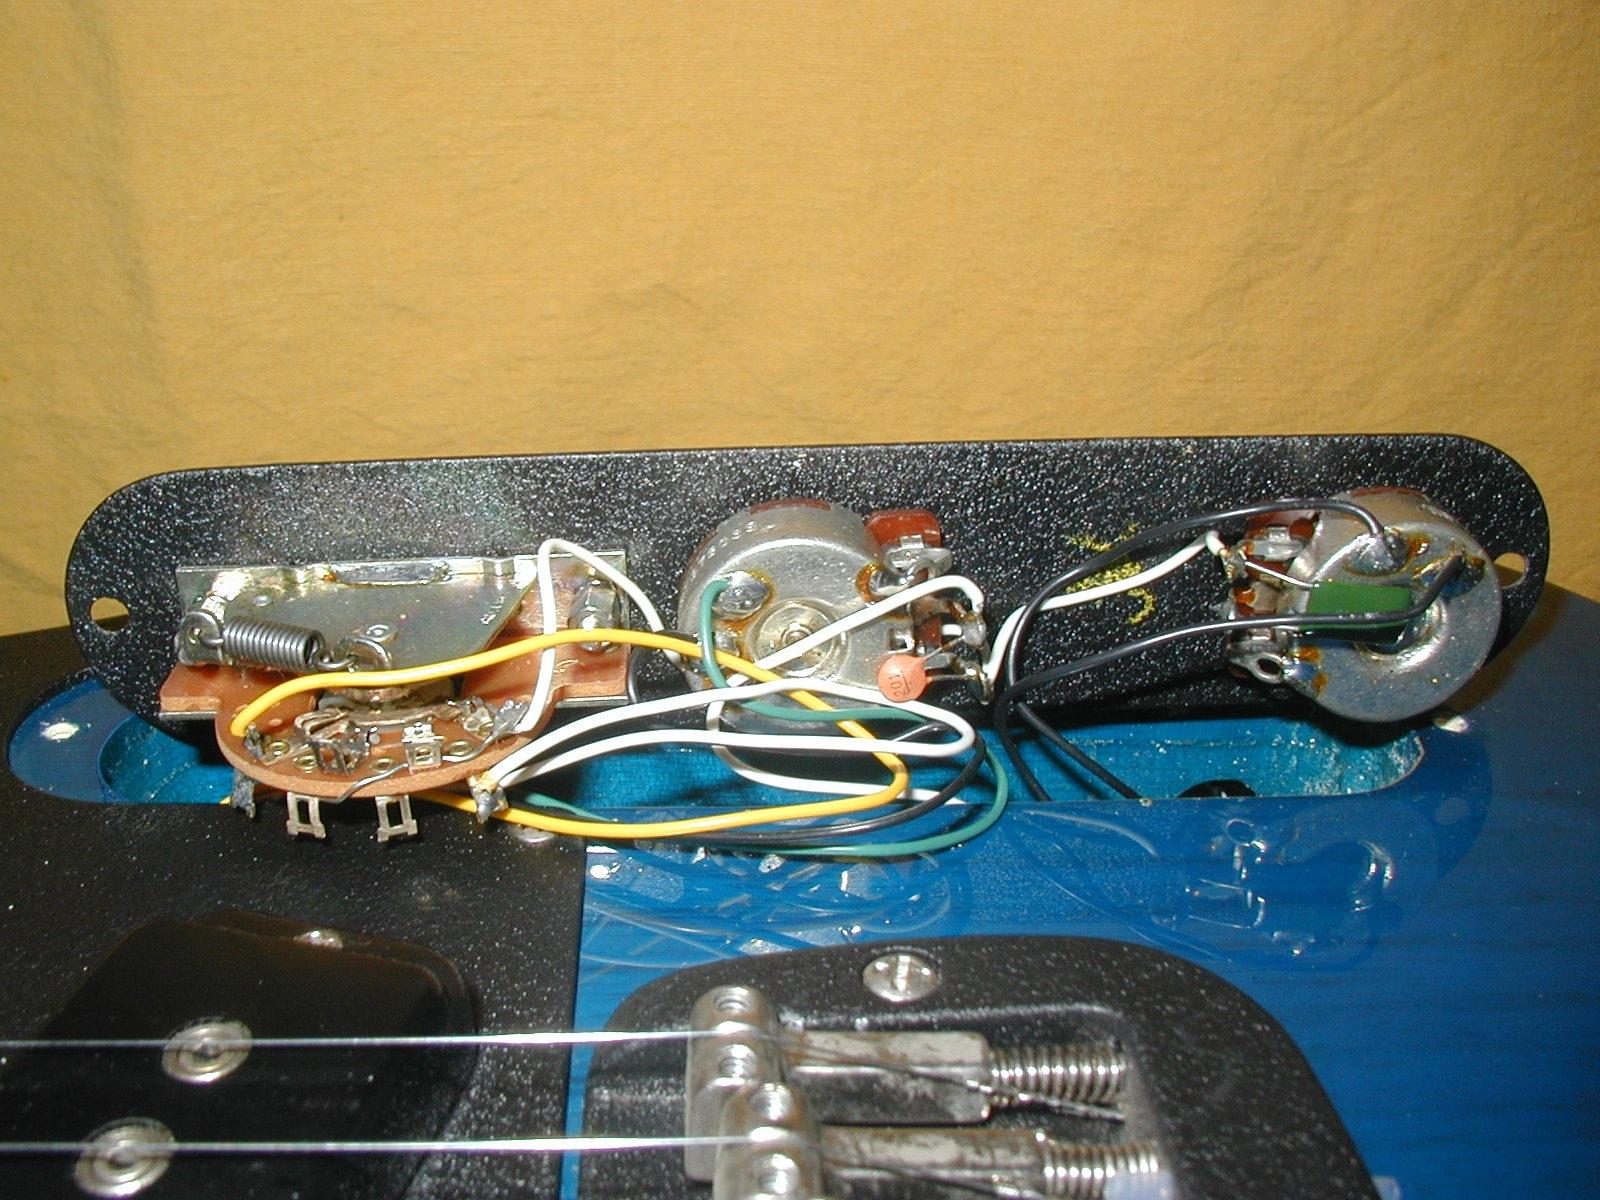 hight resolution of gl asat classic wiring diagram k4021 photocell wiring diagram dodge neon factory radio wiring g l legacy hss wiring diagram g l asat bluesboy wiring diagram